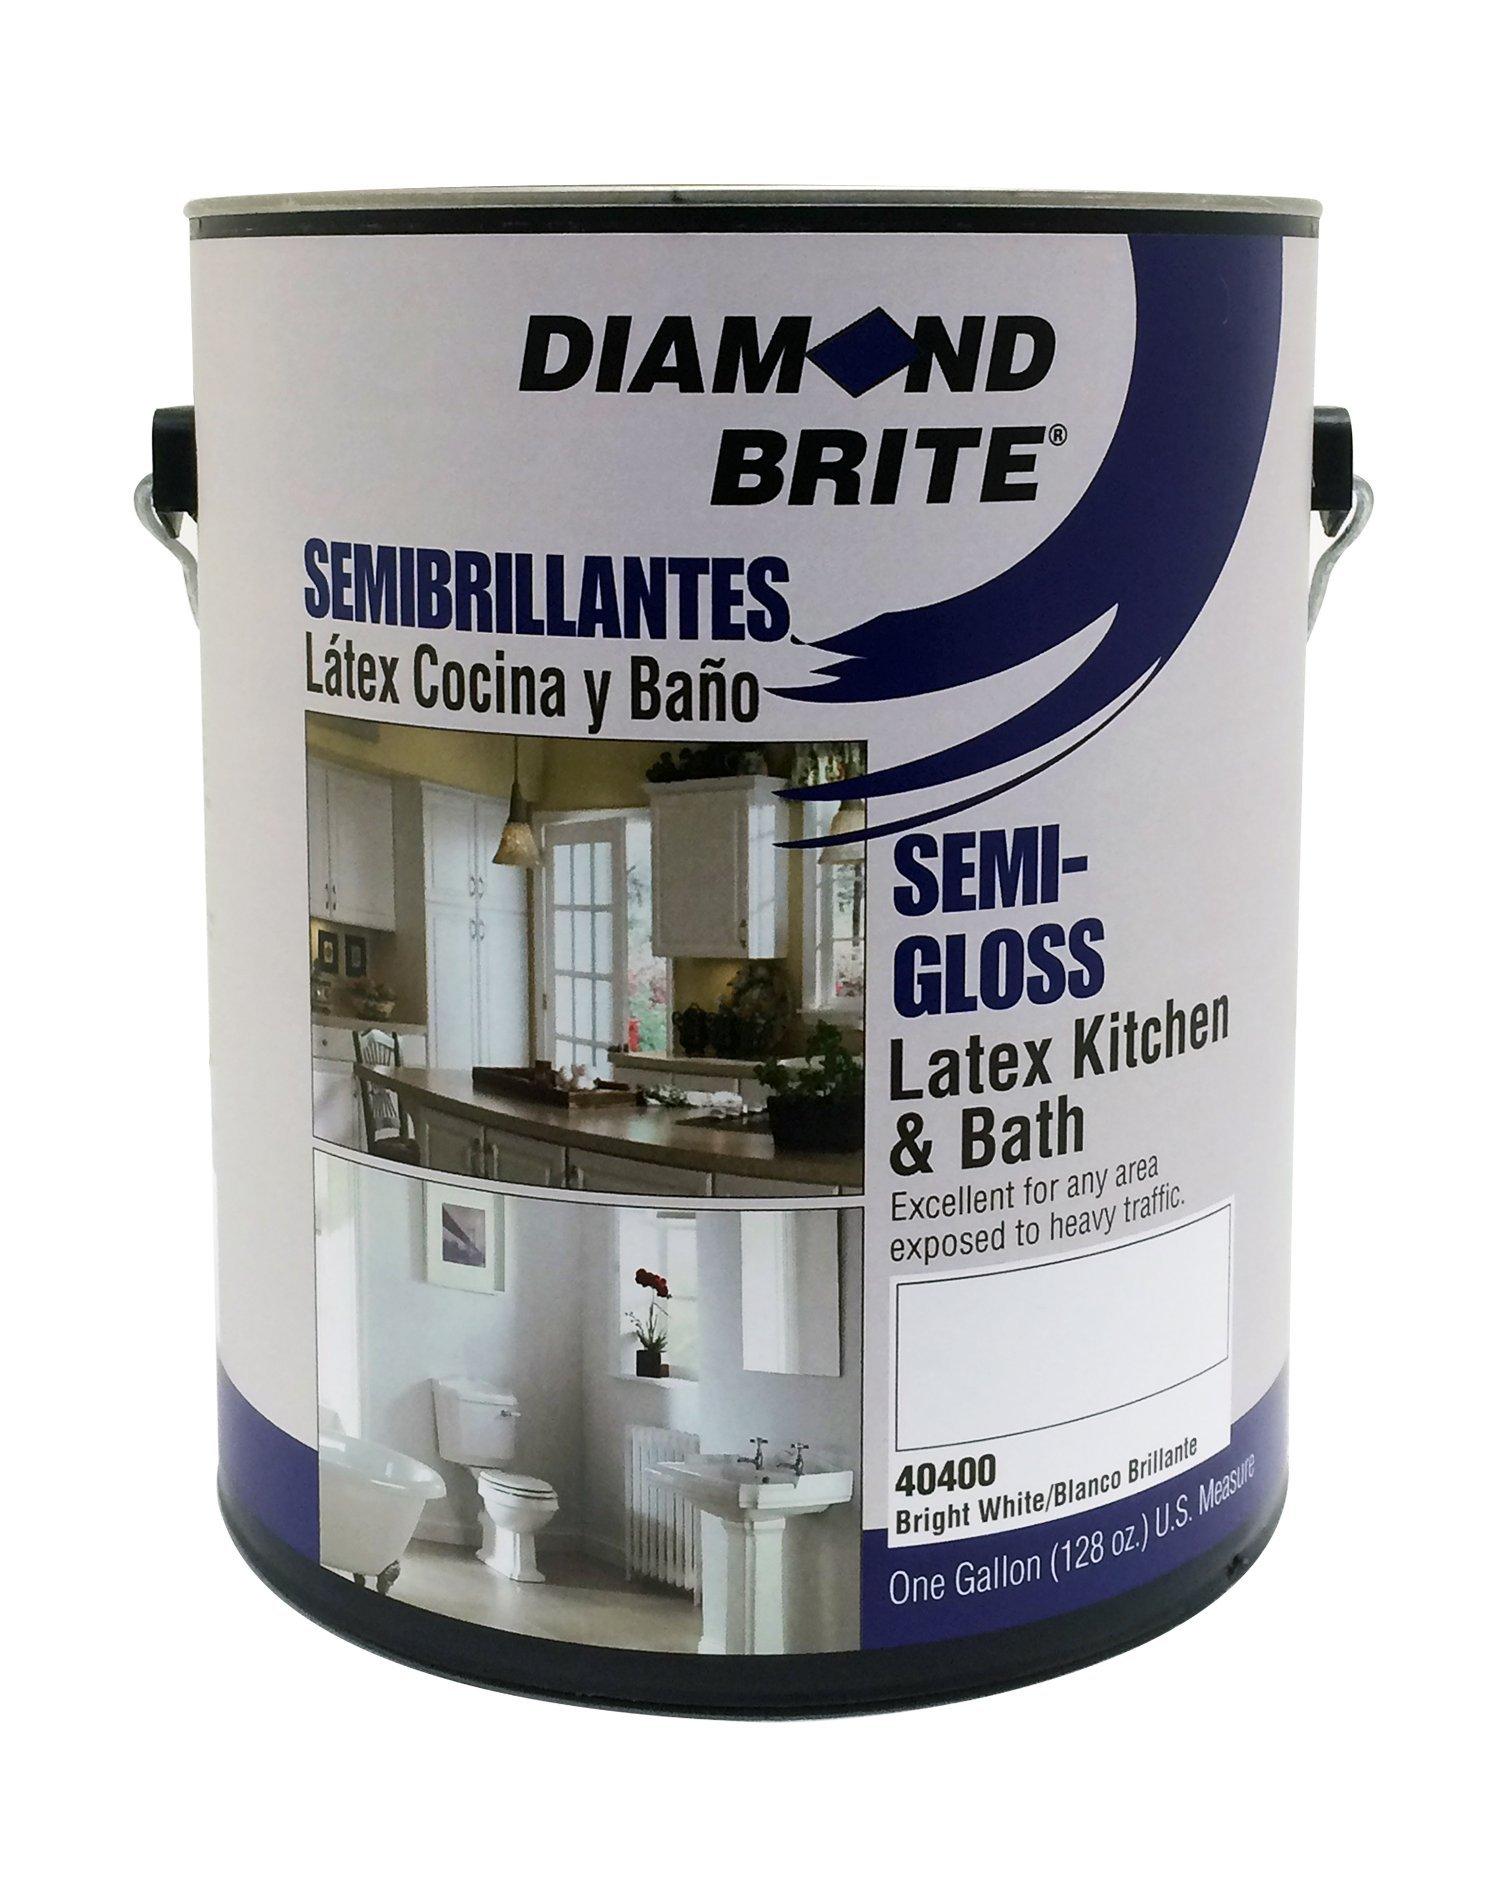 Diamond Brite Paint 40400 1-Gallon Kichen and Bath with Mildew Protection Semi Gloss Latex Paint White